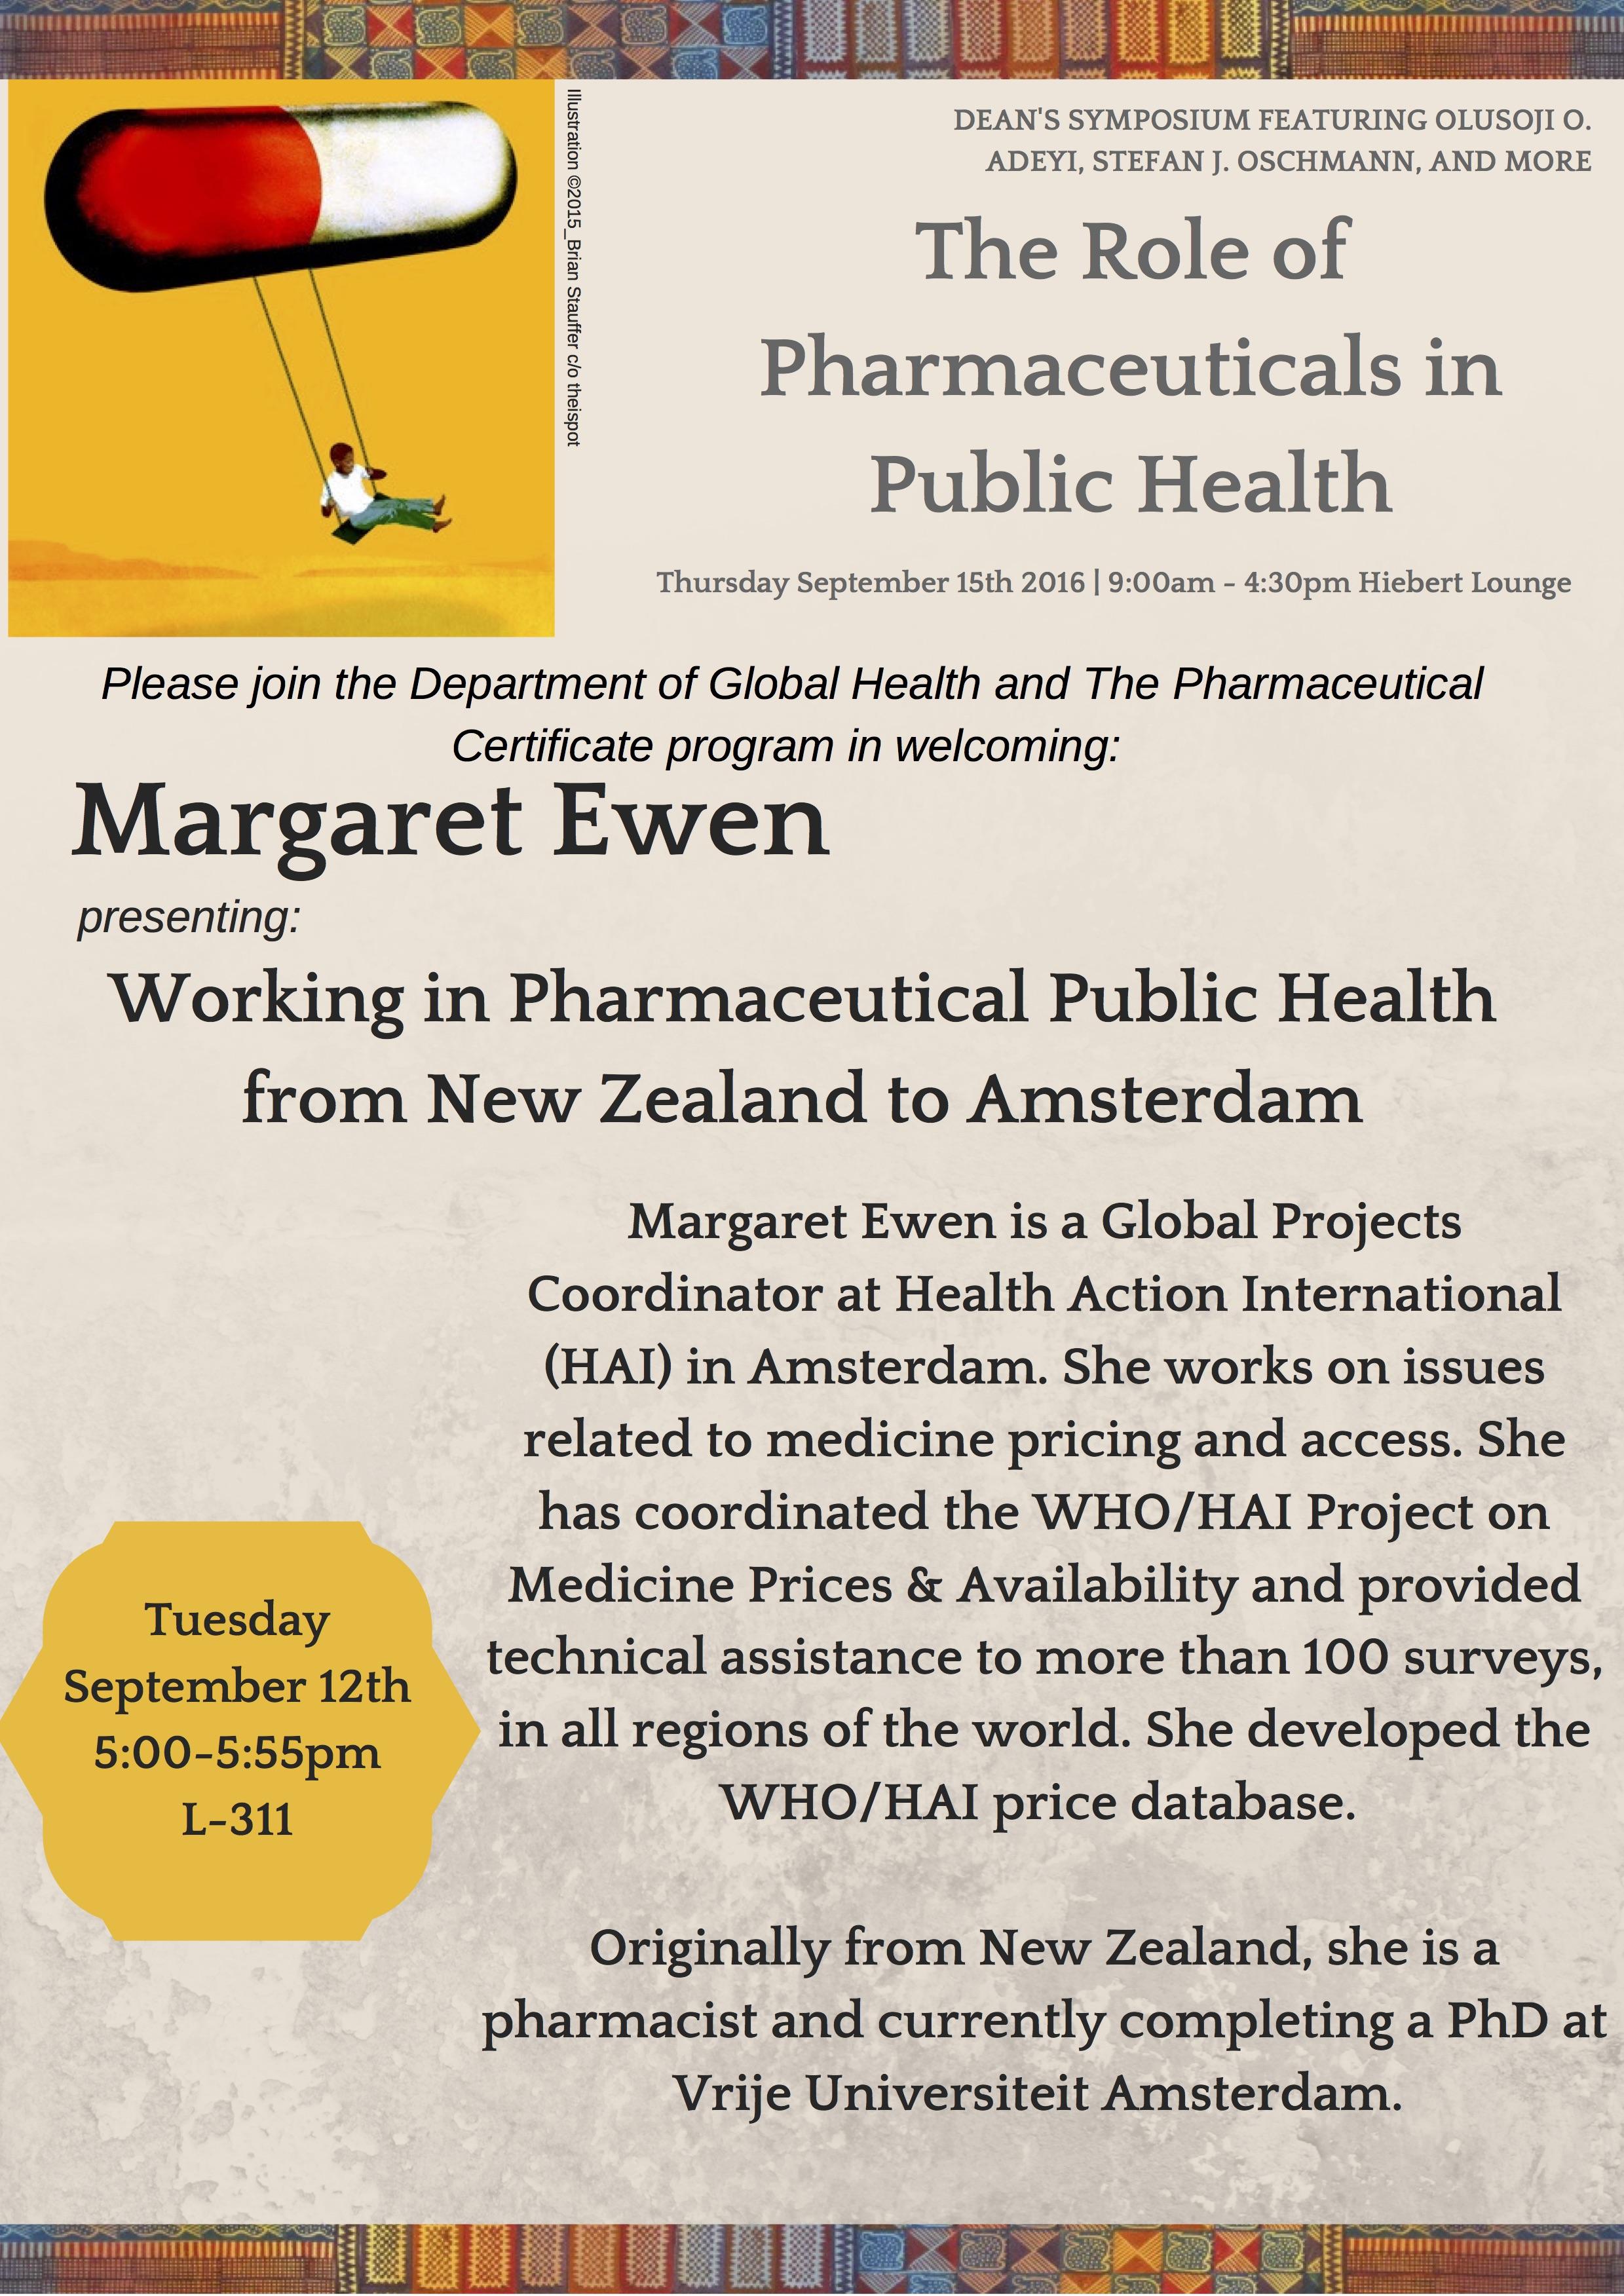 Margaret Ewen Presents Working In Pharmaceutical Public Health From